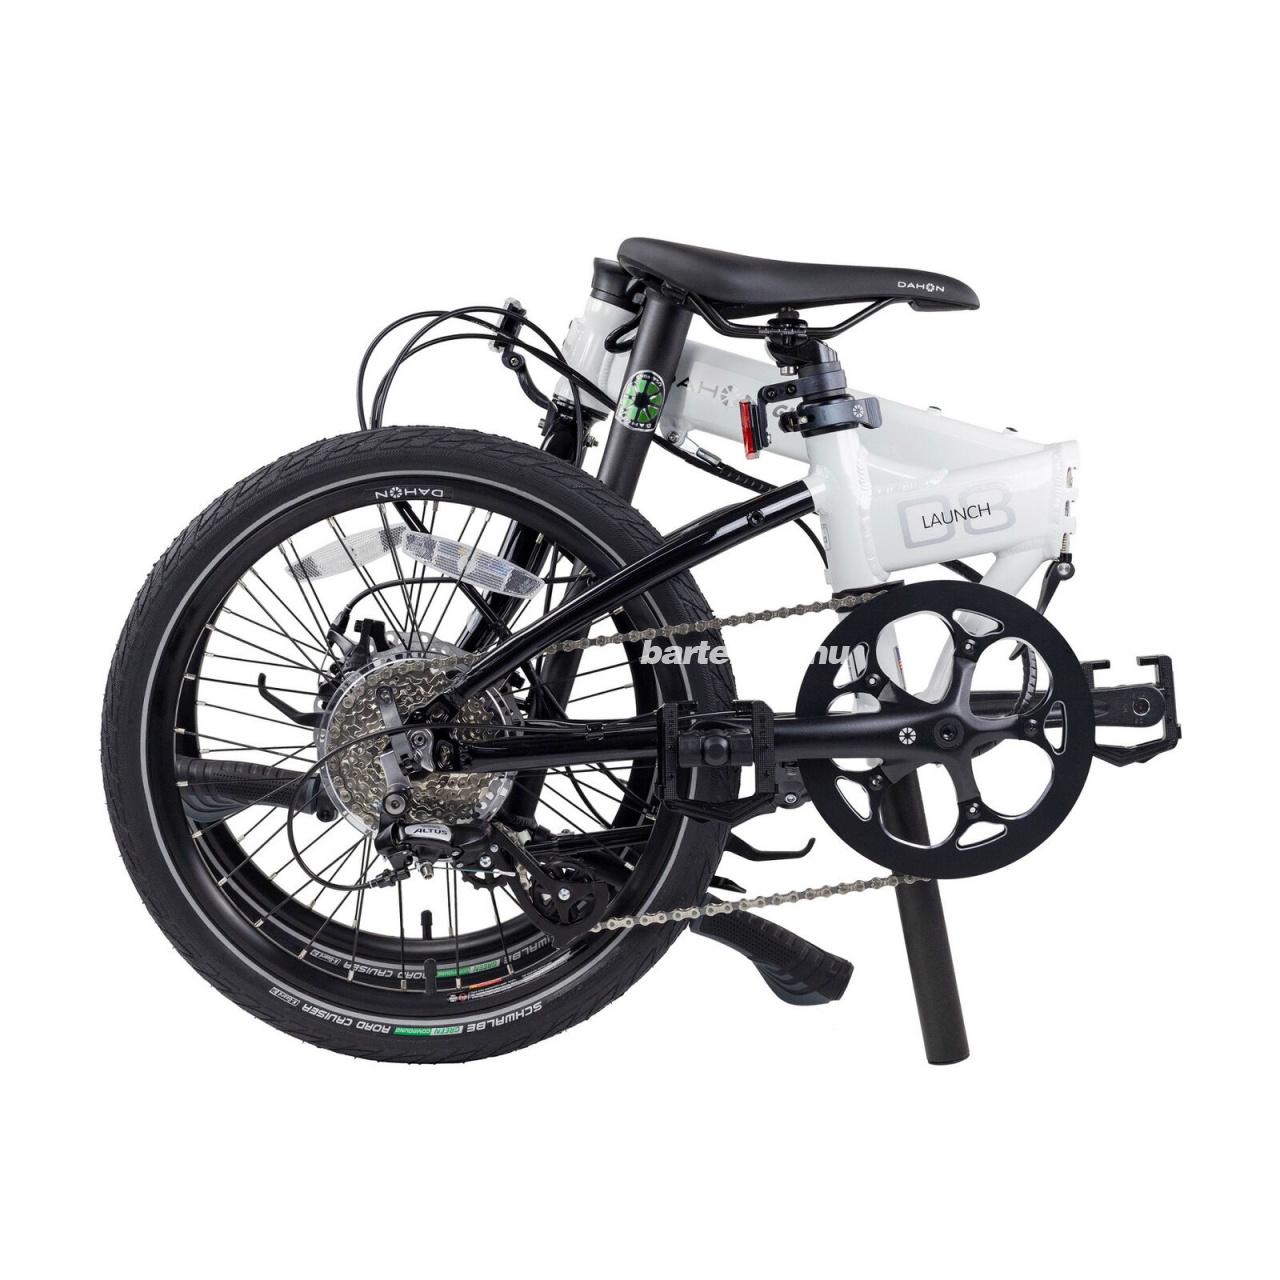 Dahon Launch D8 Folding Bike White and Black